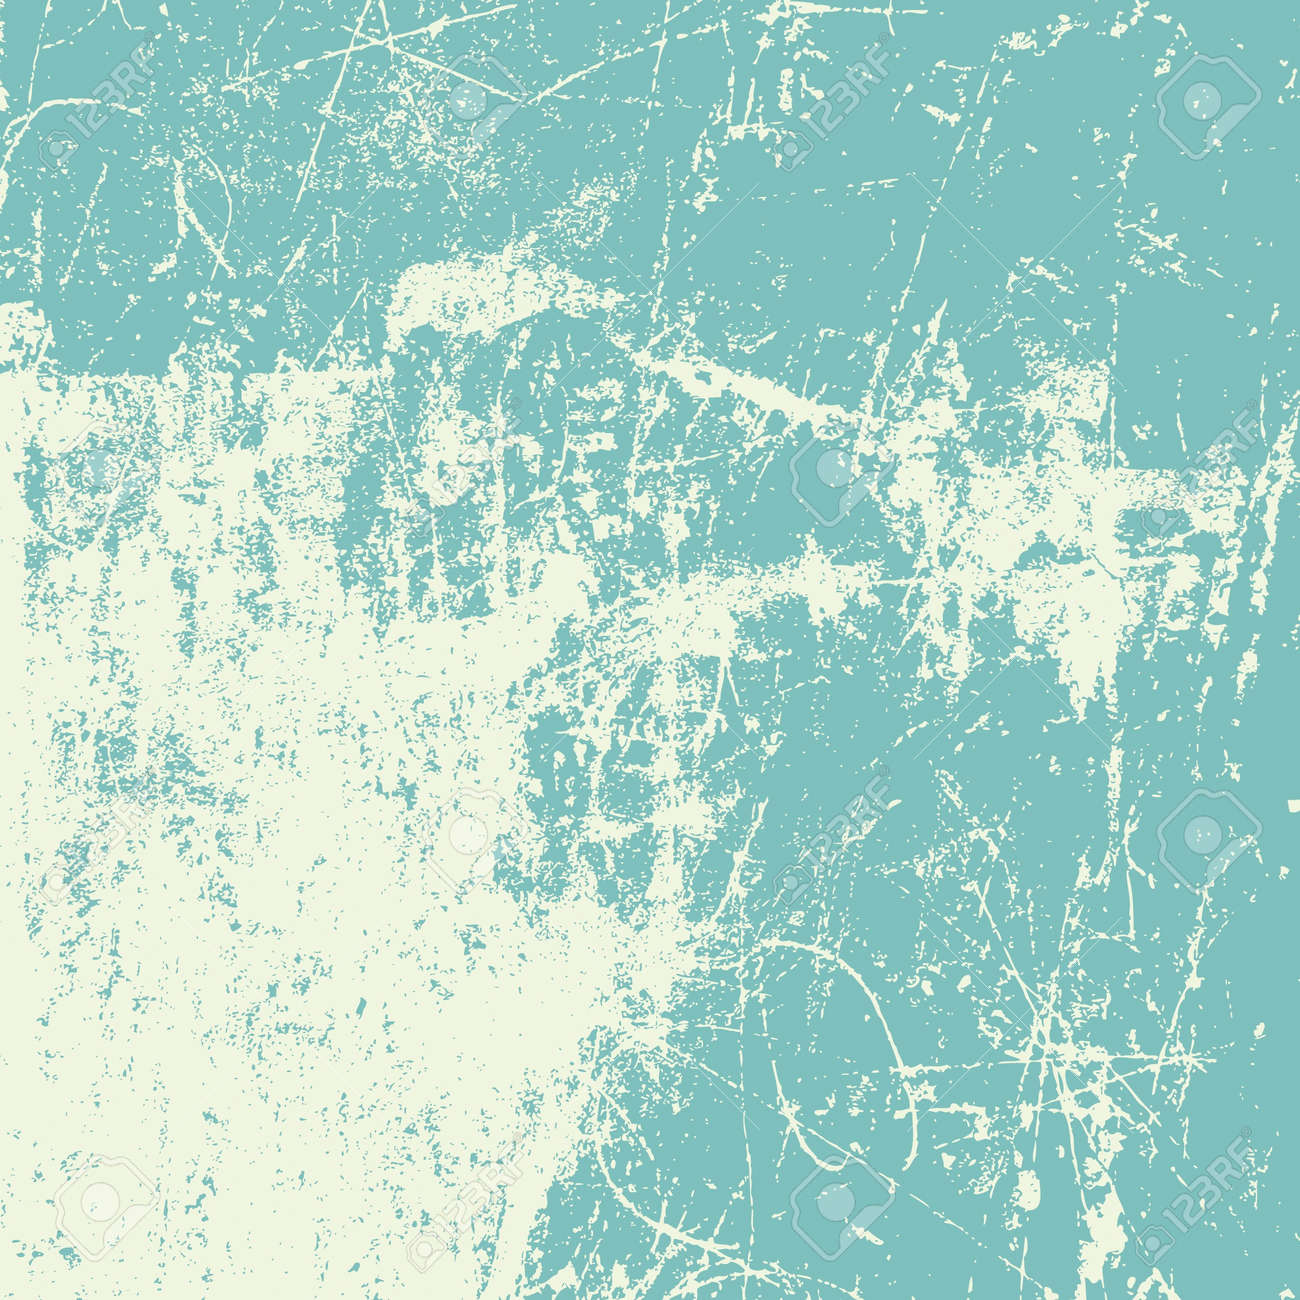 Grunge texture, vector illustration - 20057784